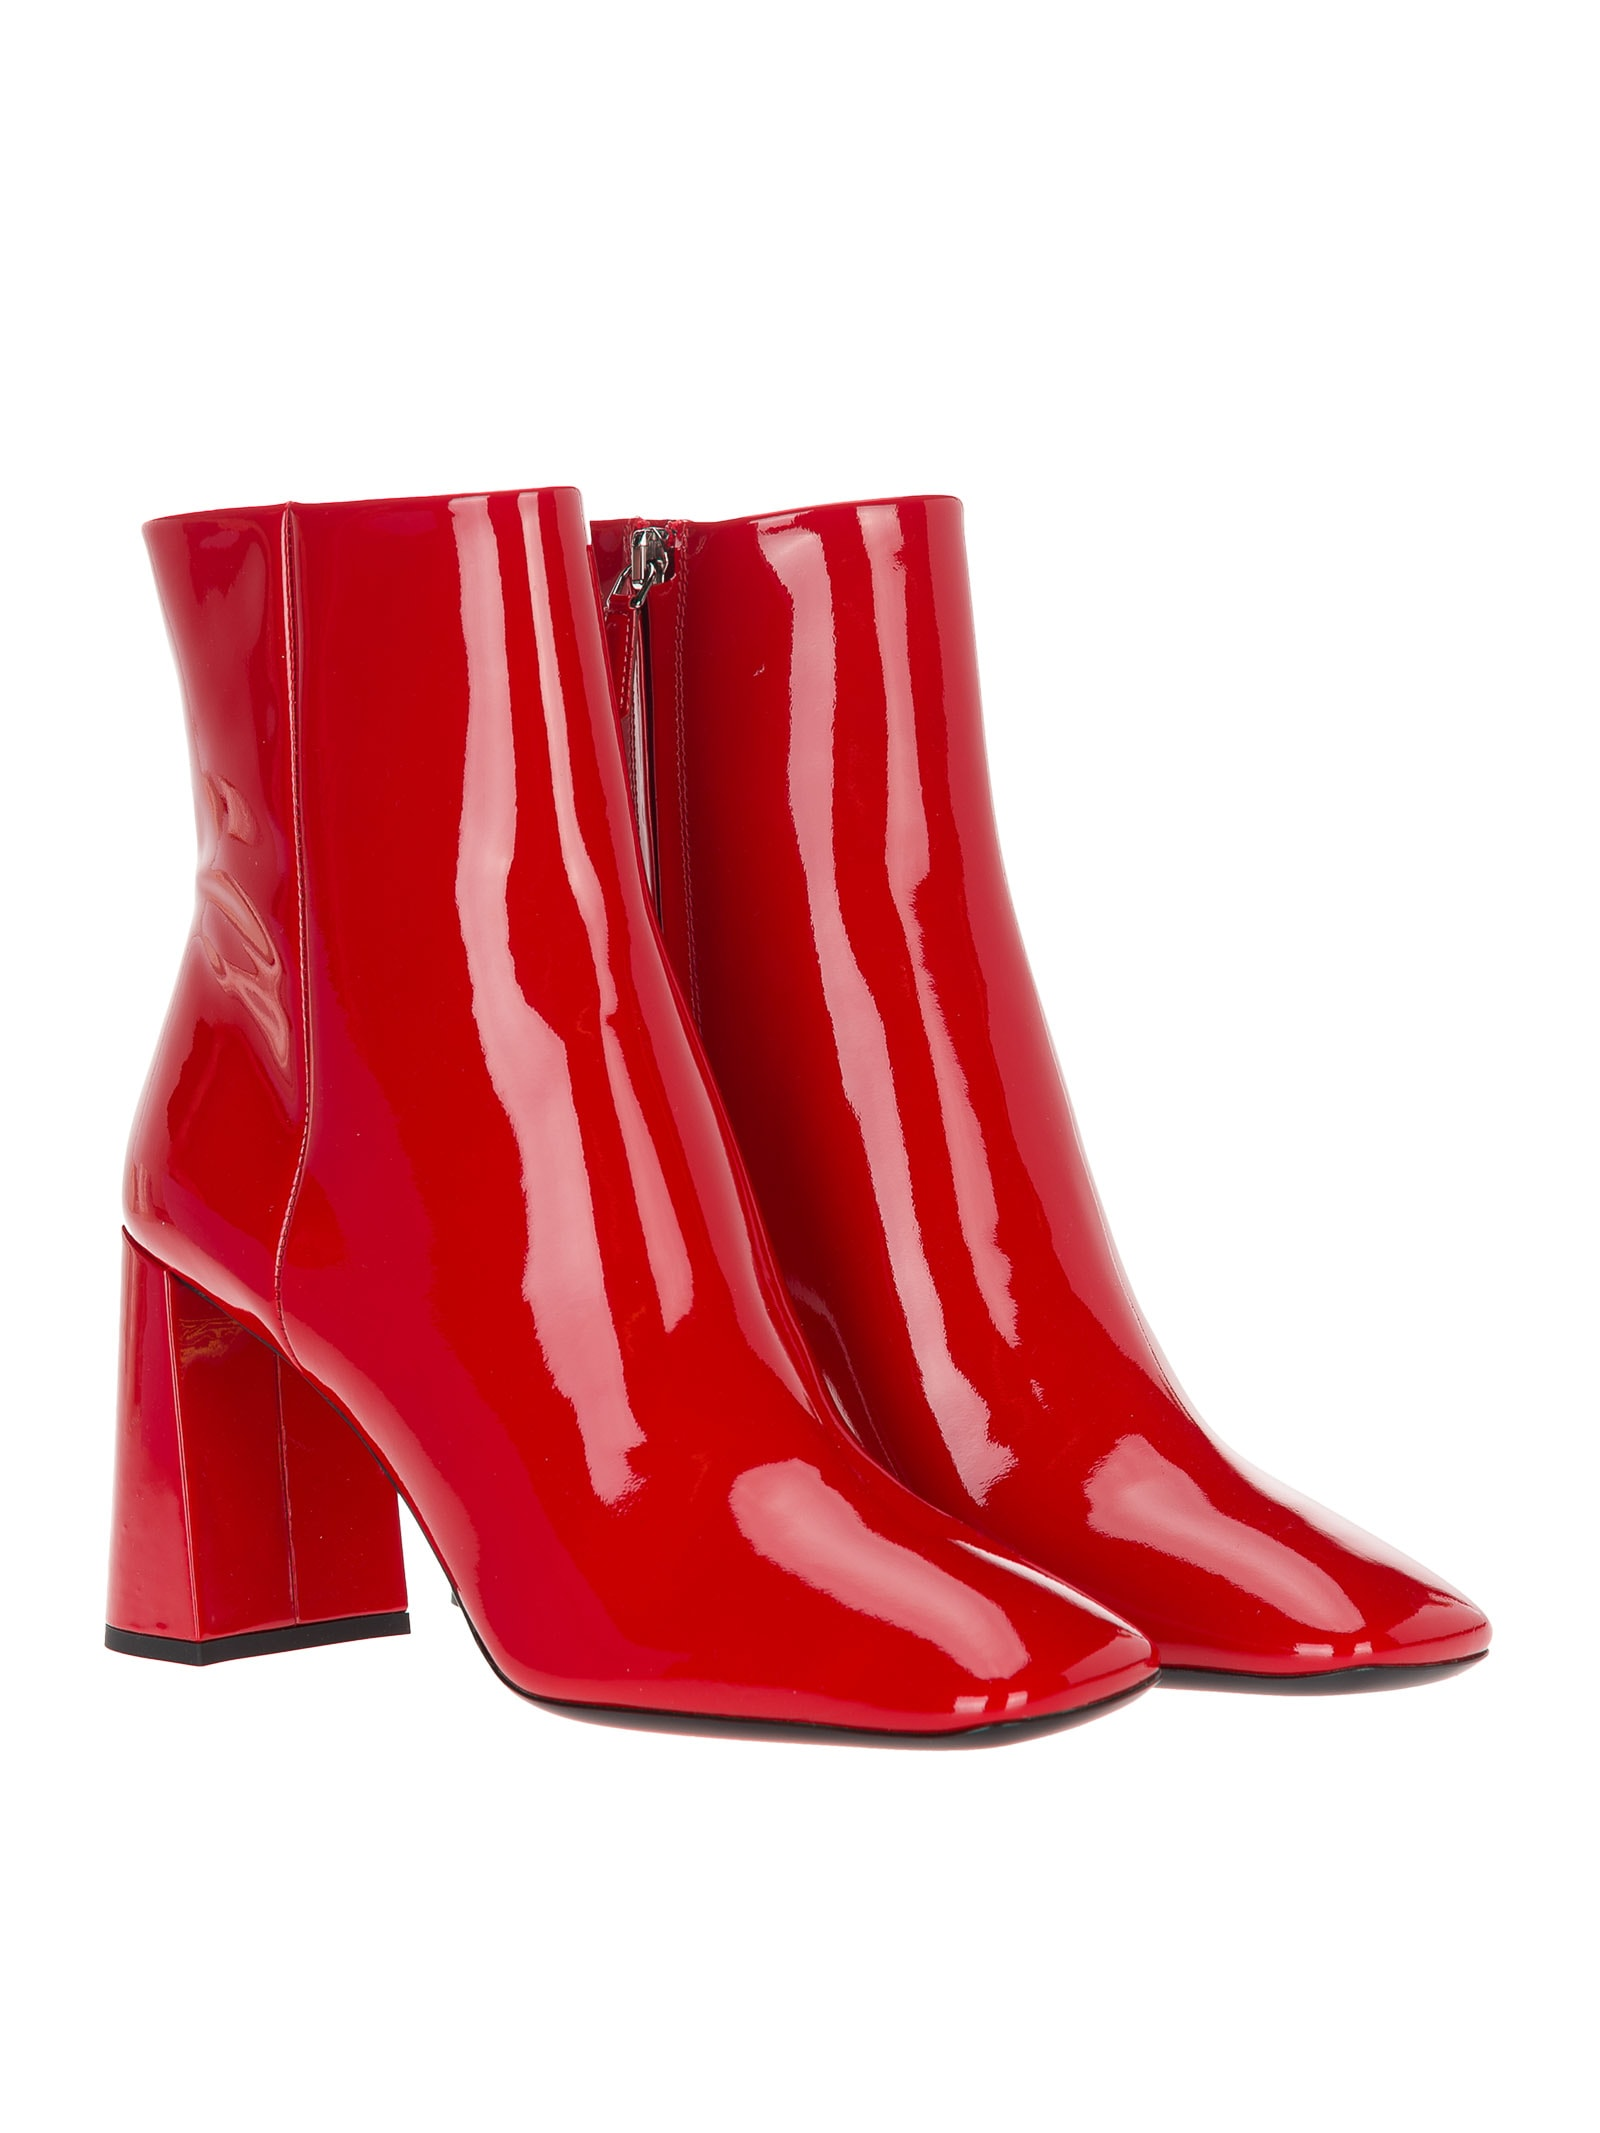 Prada Prada Patent Leather Ankle Boots